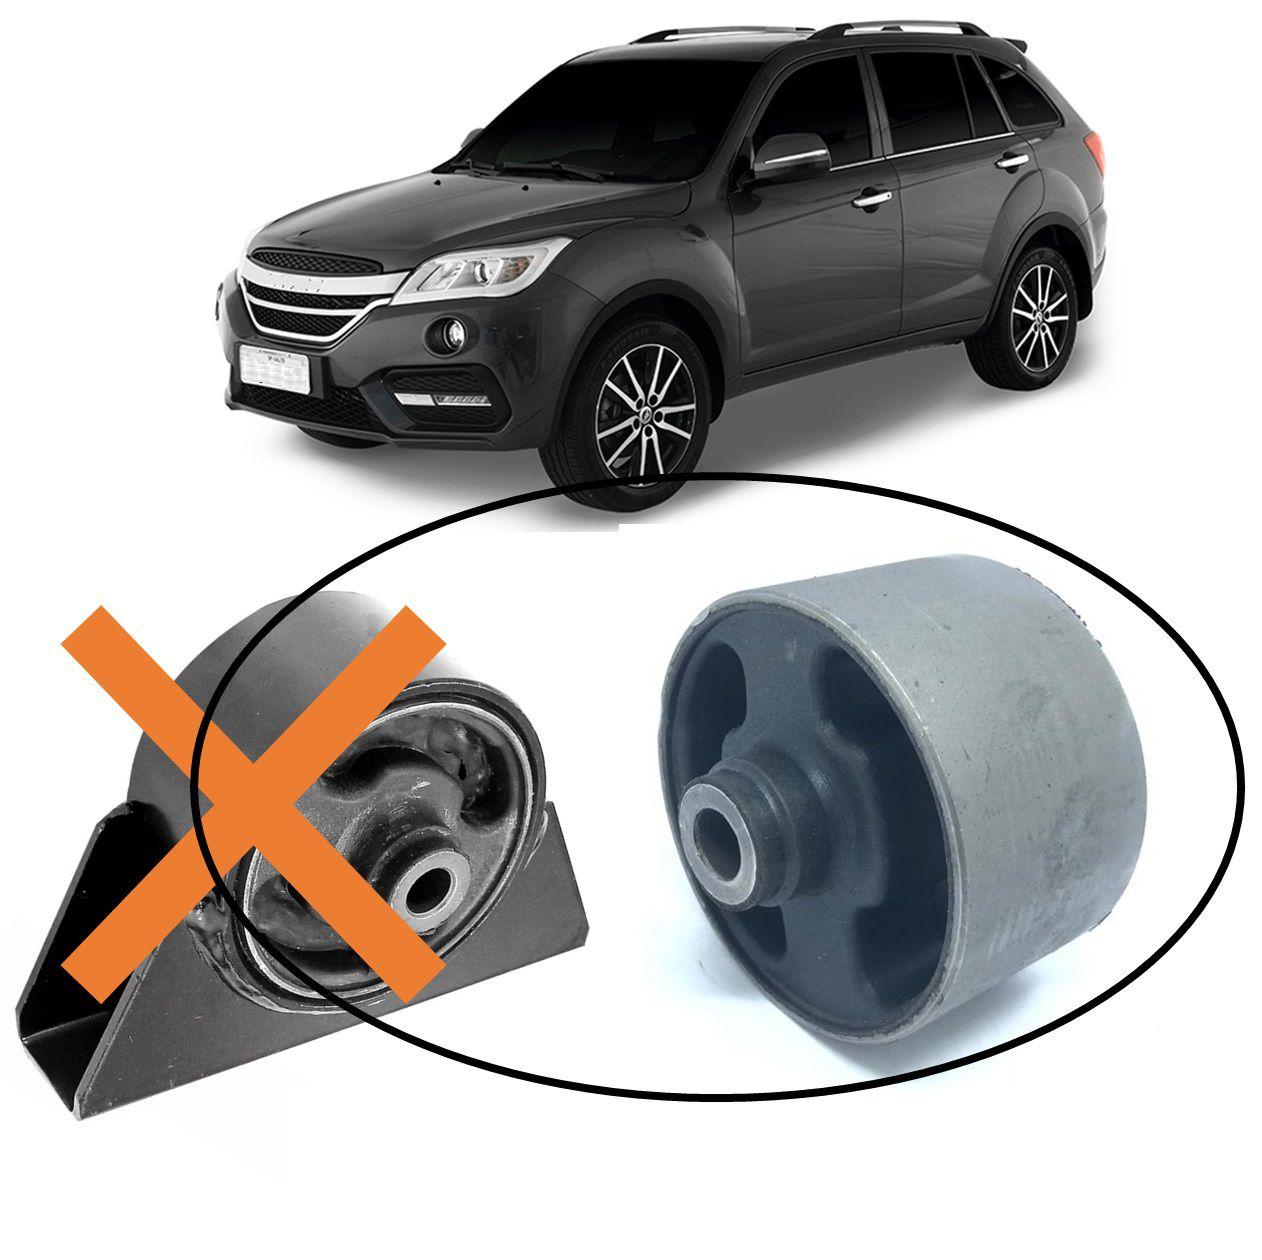 Bucha Refil Calço Coxim Dianteiro Frontal Motor Lifan X60 2013 2014 2015